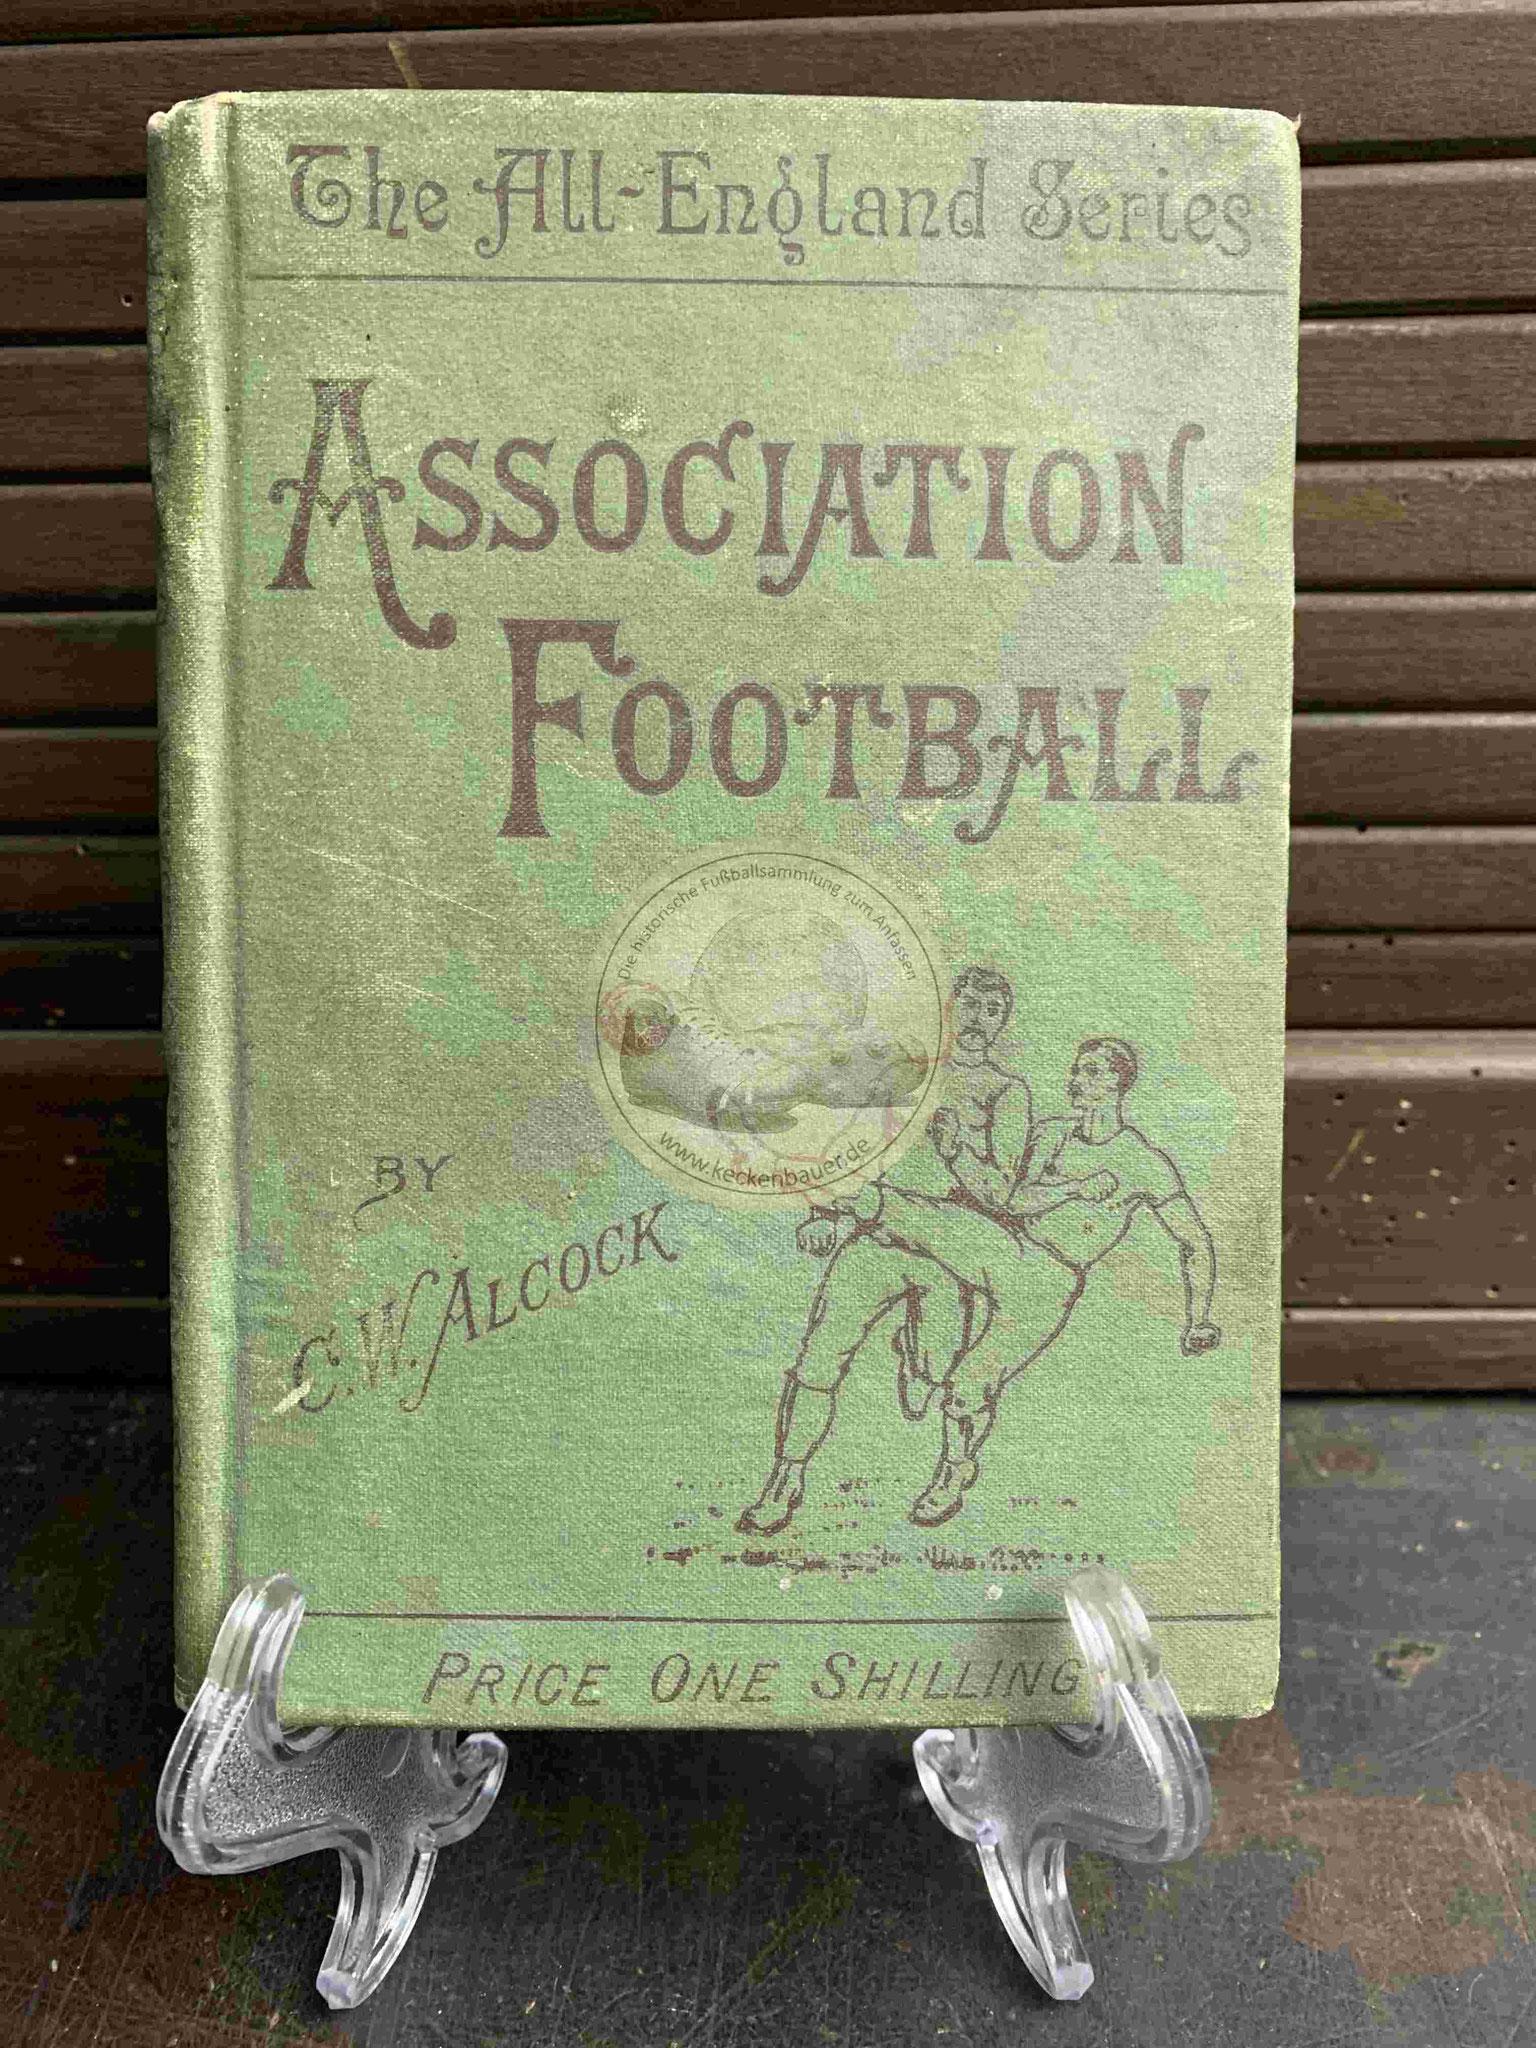 The All-England Series Association Football by C.W. Alcock aus dem Jahr 1900